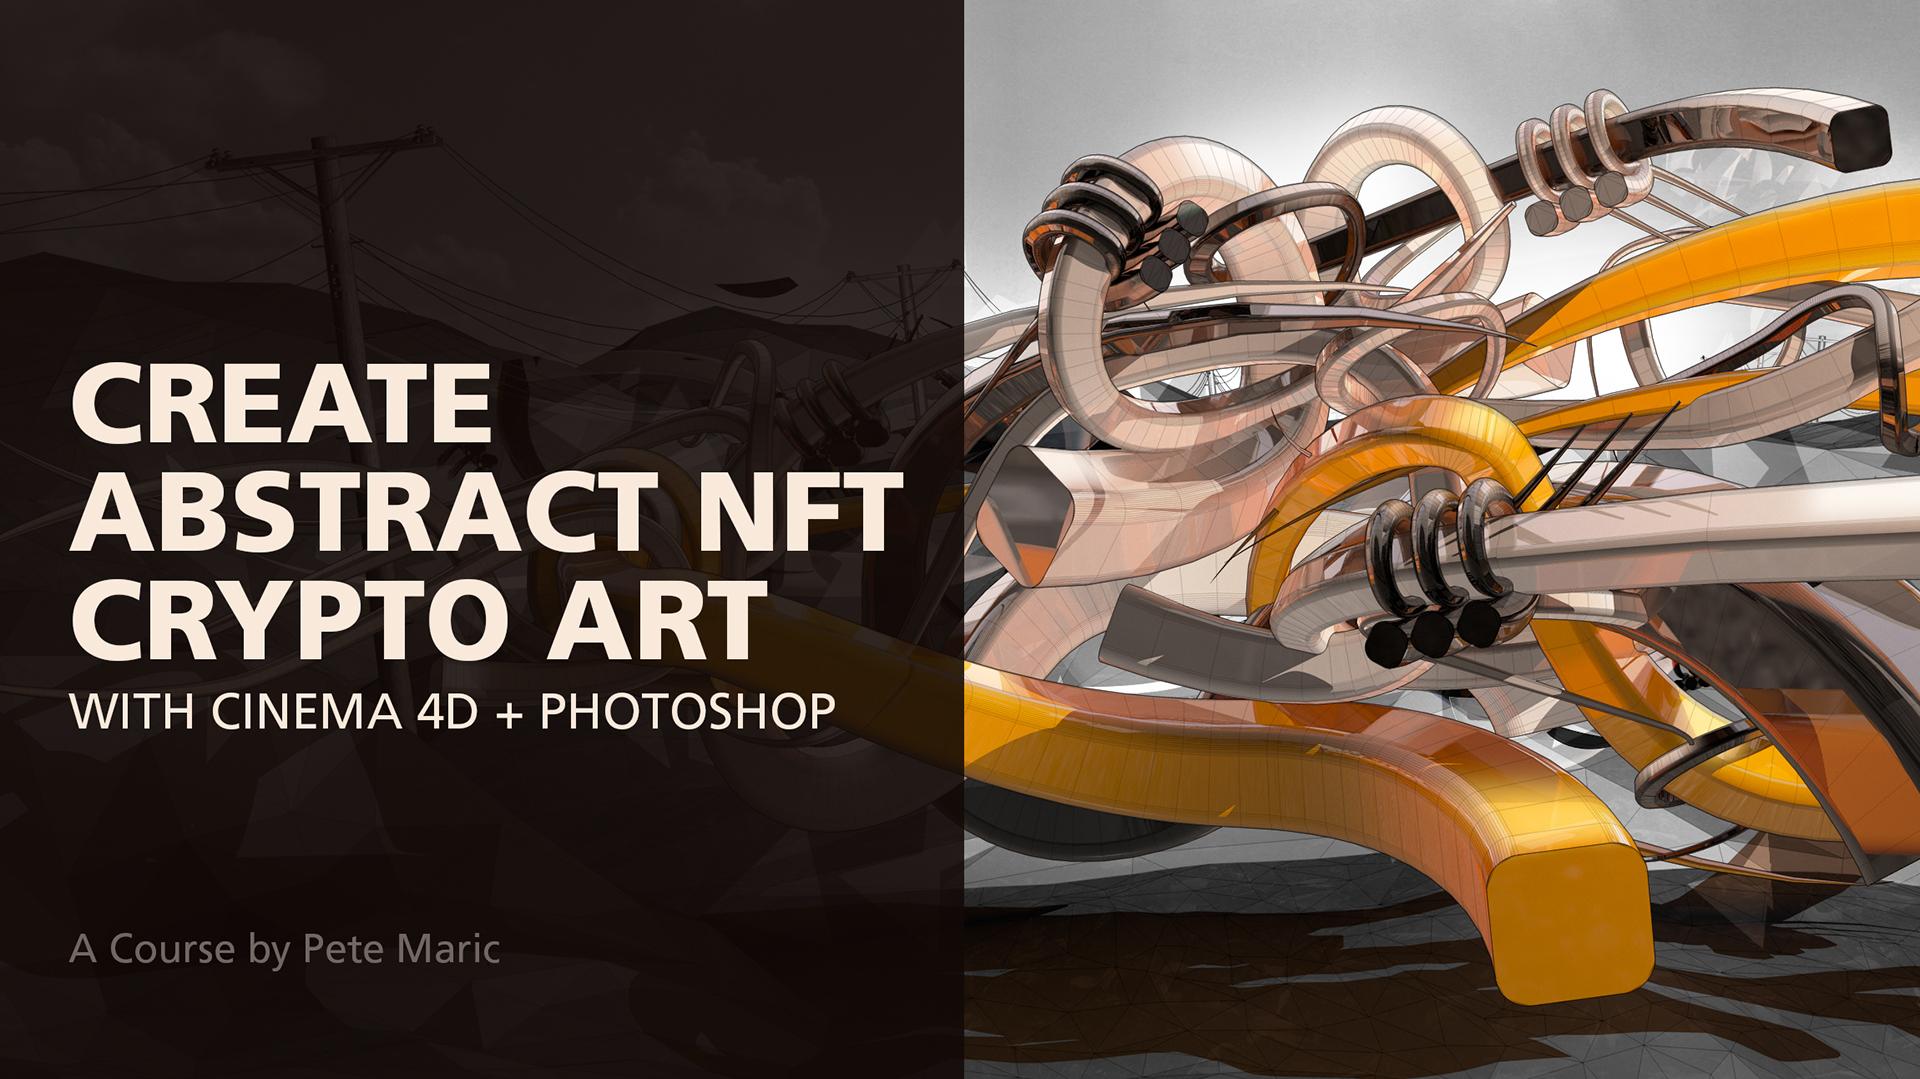 Create Abstract NFT Crypto Art with Cinema 4D + Photoshop